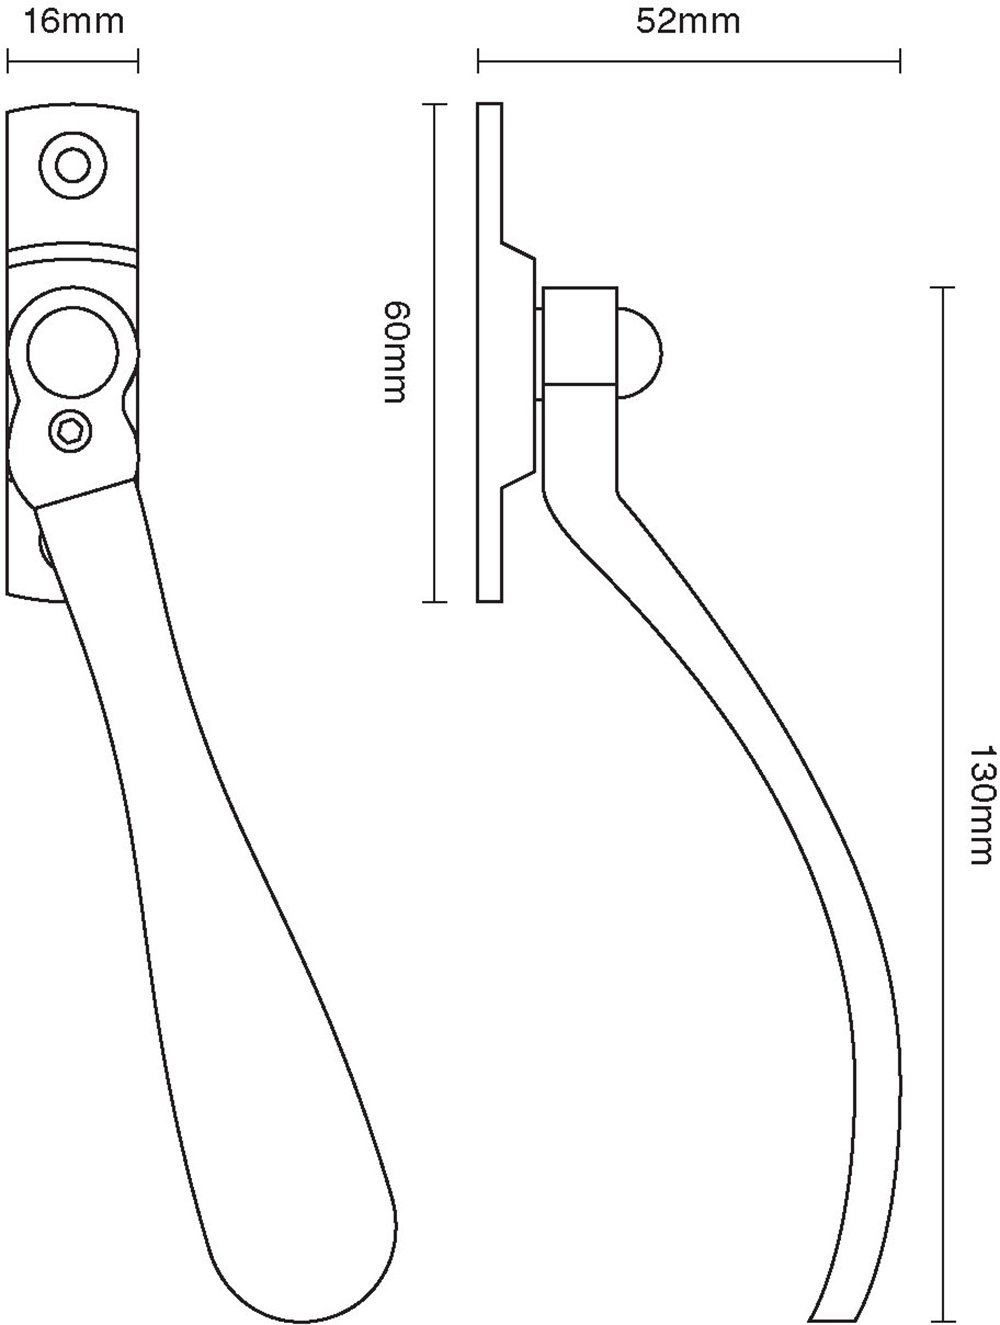 Lockable Window Espagnolette Handle – Spoon End – Narrow Style